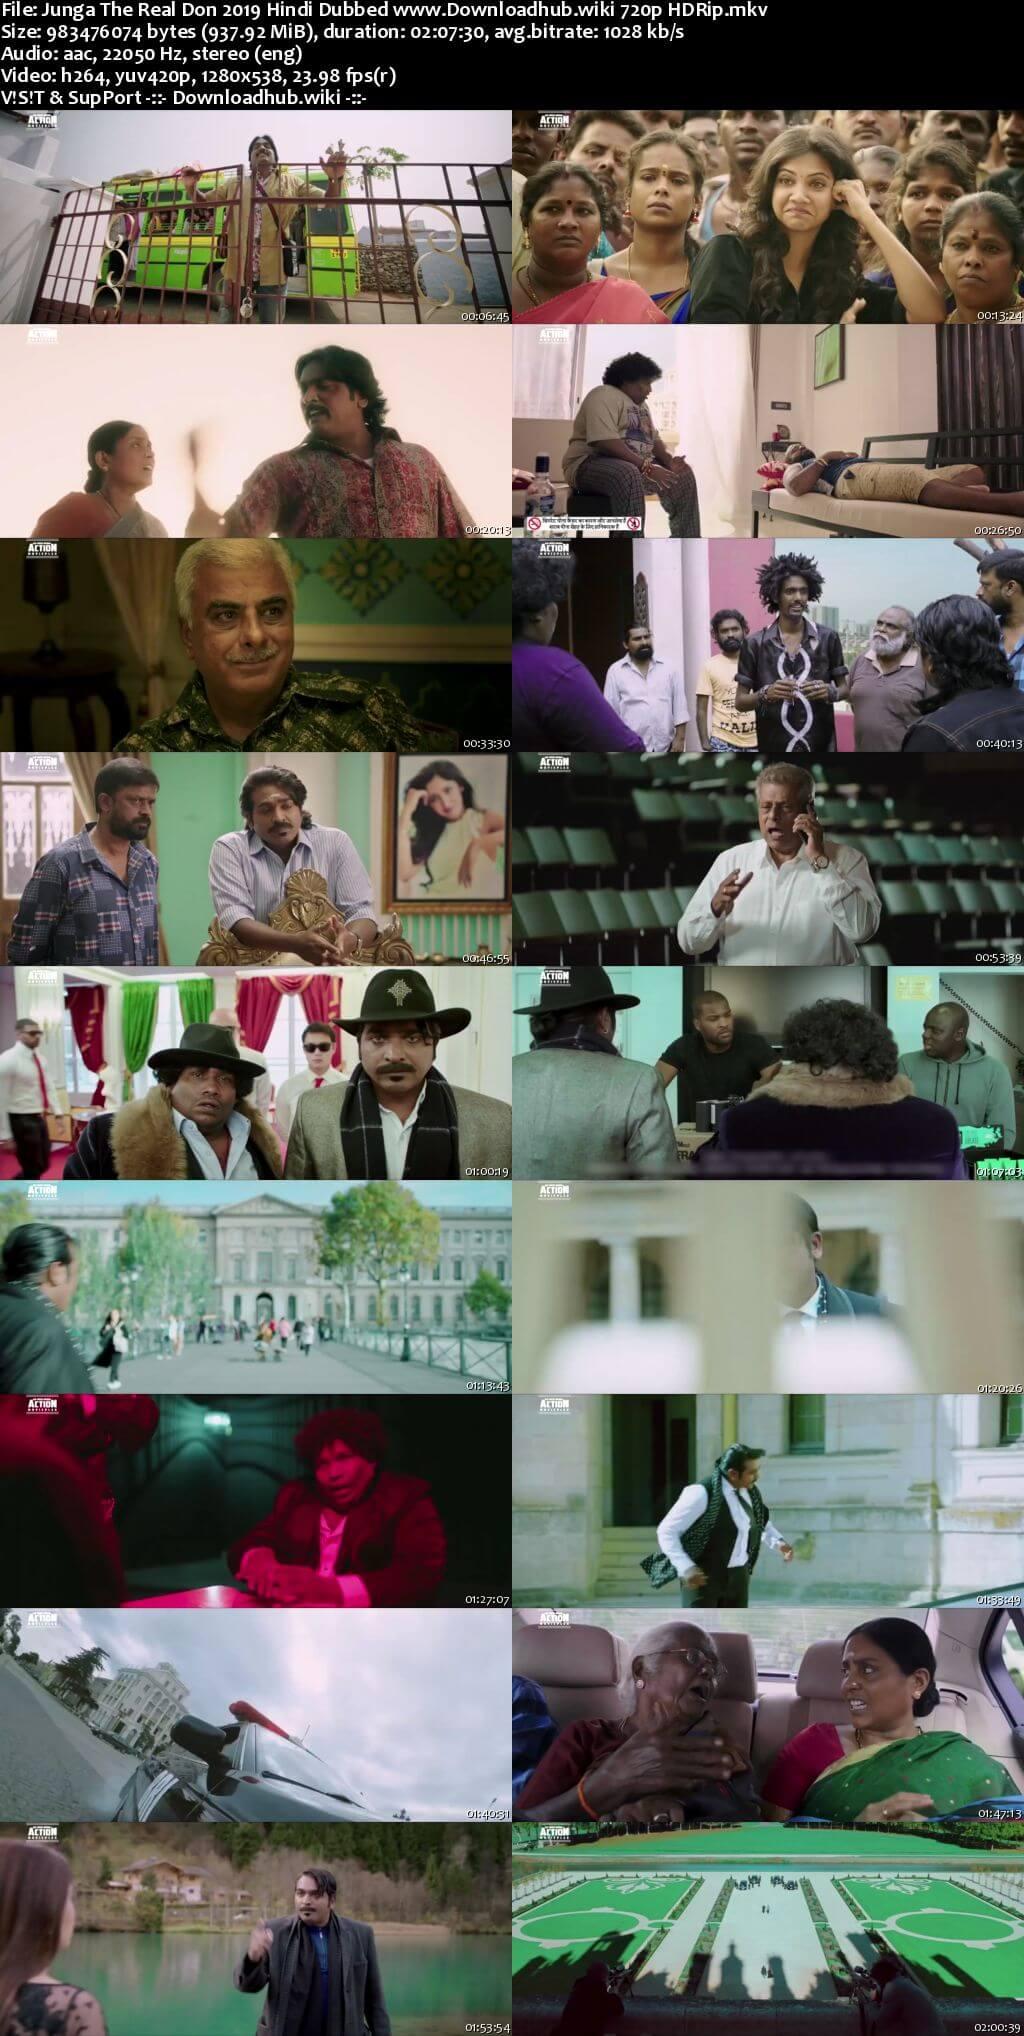 Junga The Real Don 2019 Hindi Dubbed 720p HDRip x264